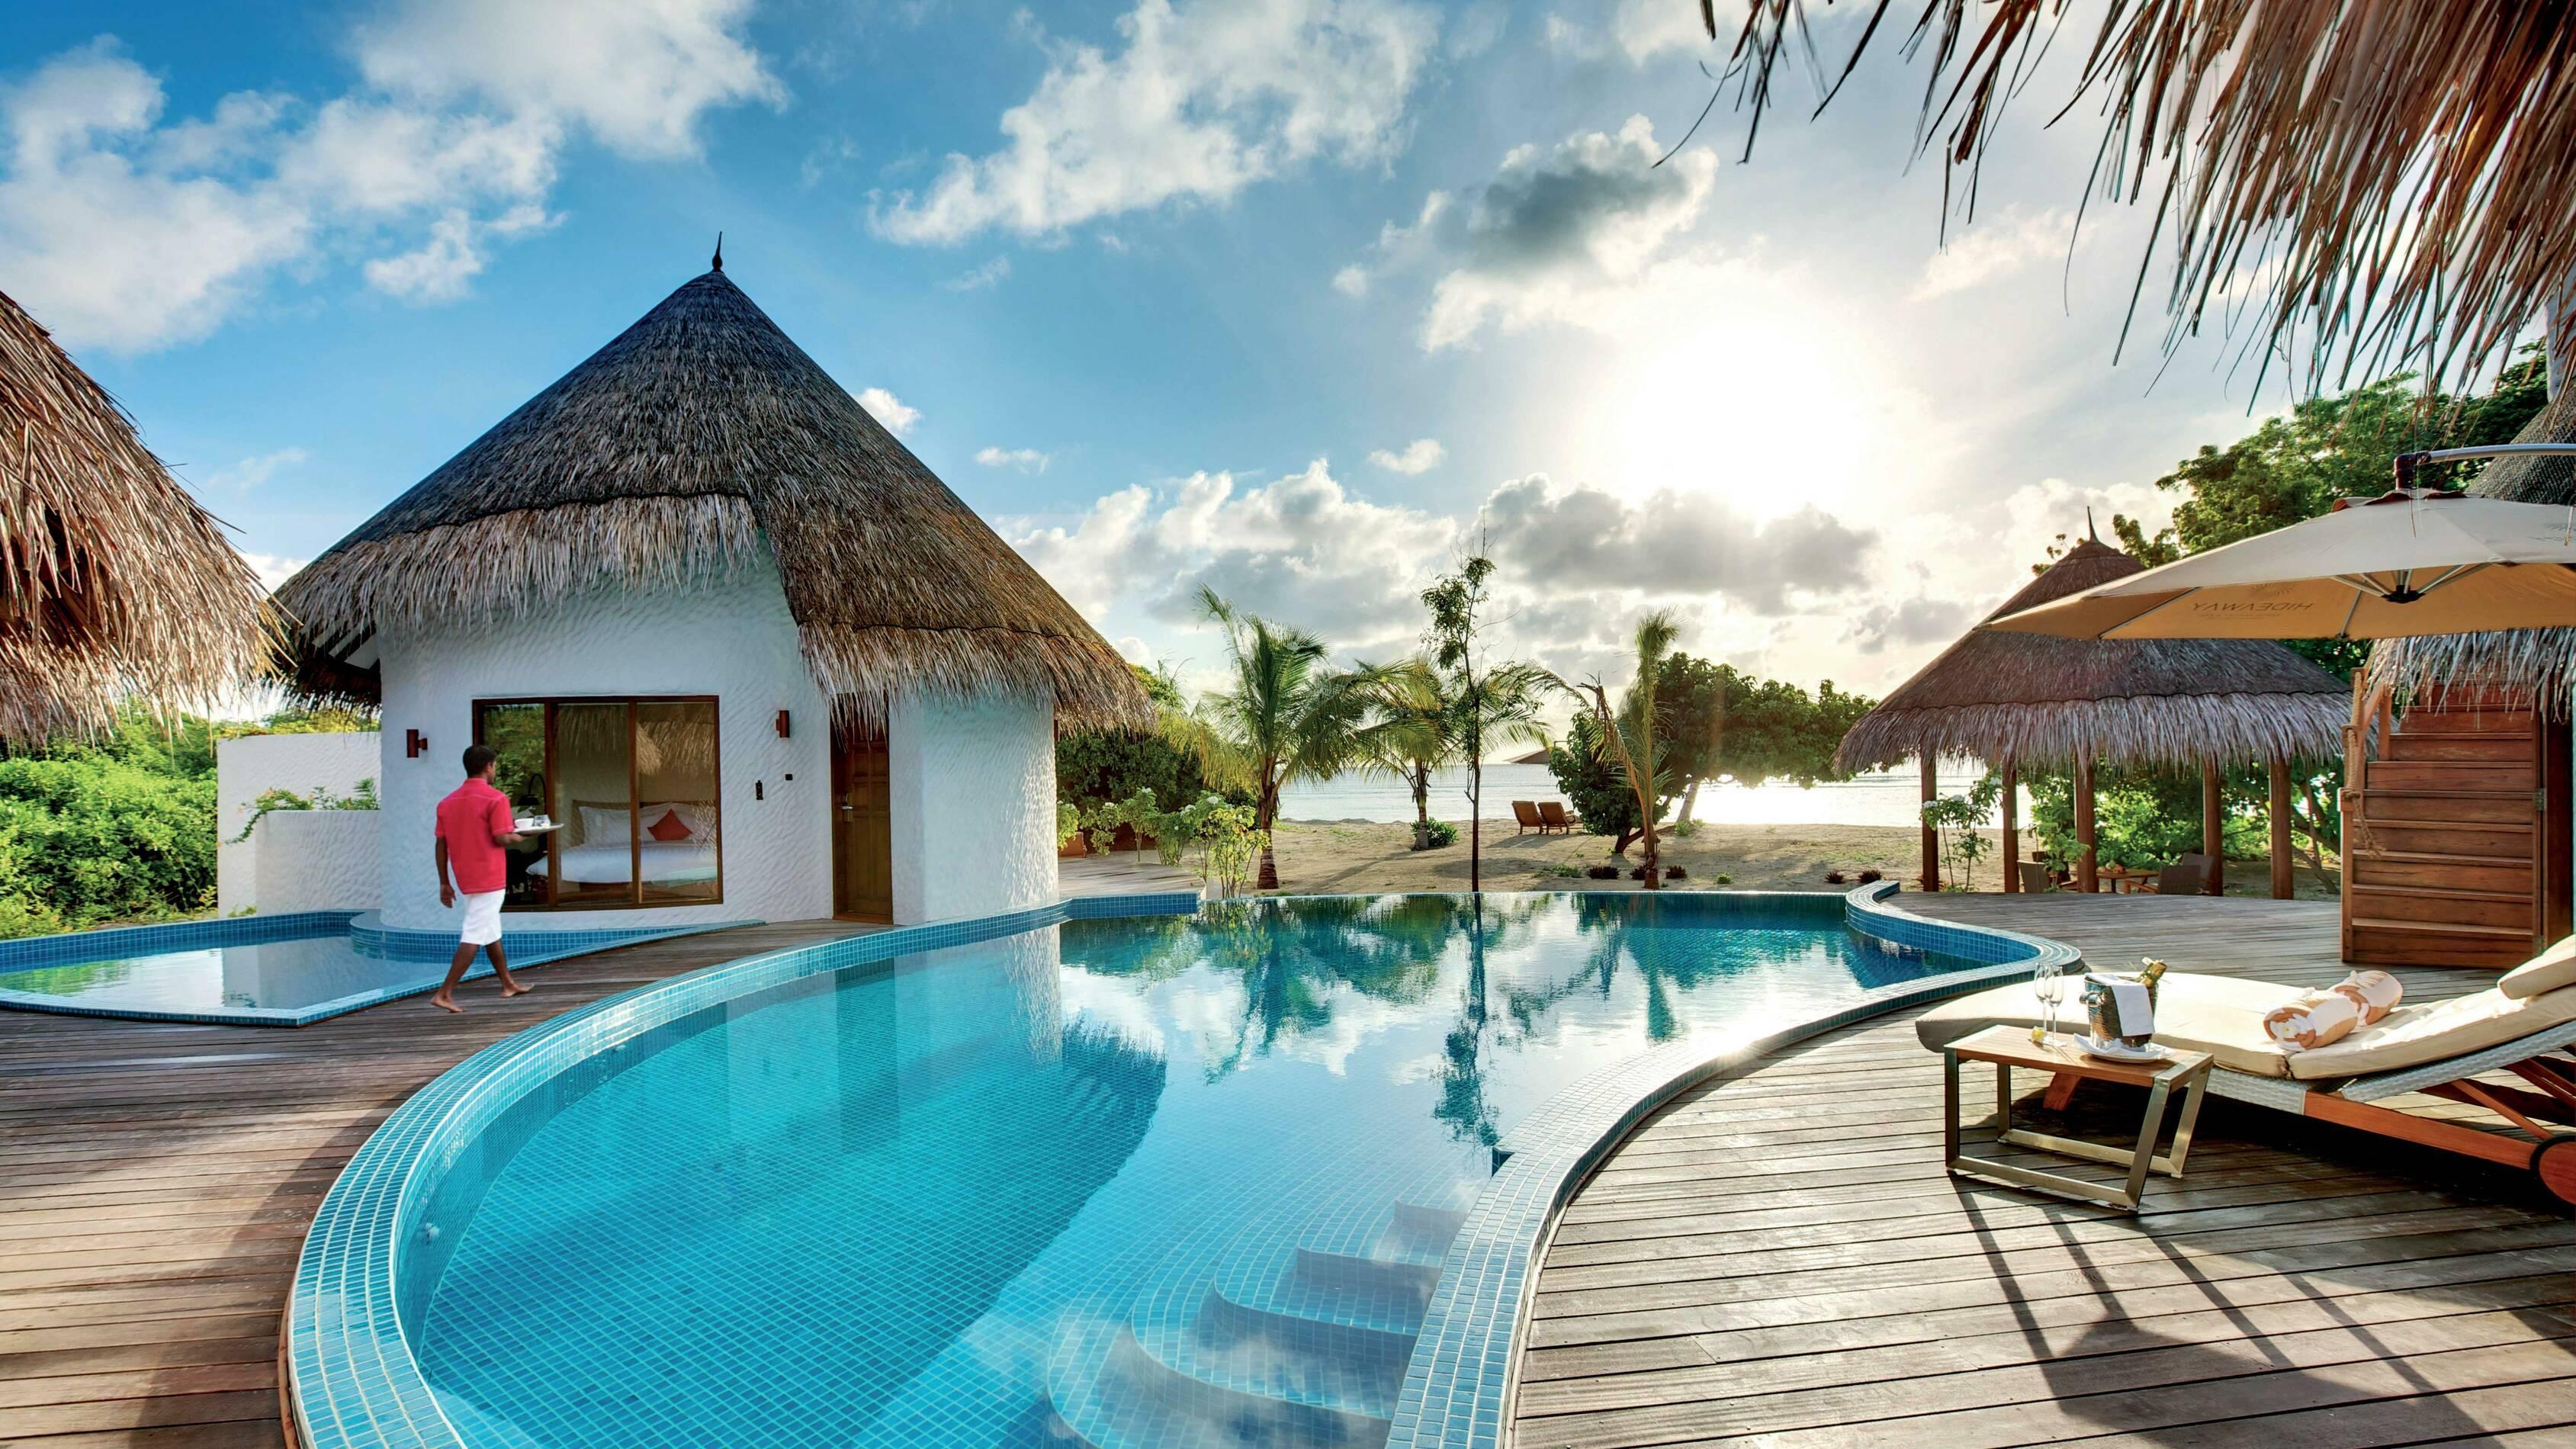 Hideaway Beach Palace Piscine Maldives